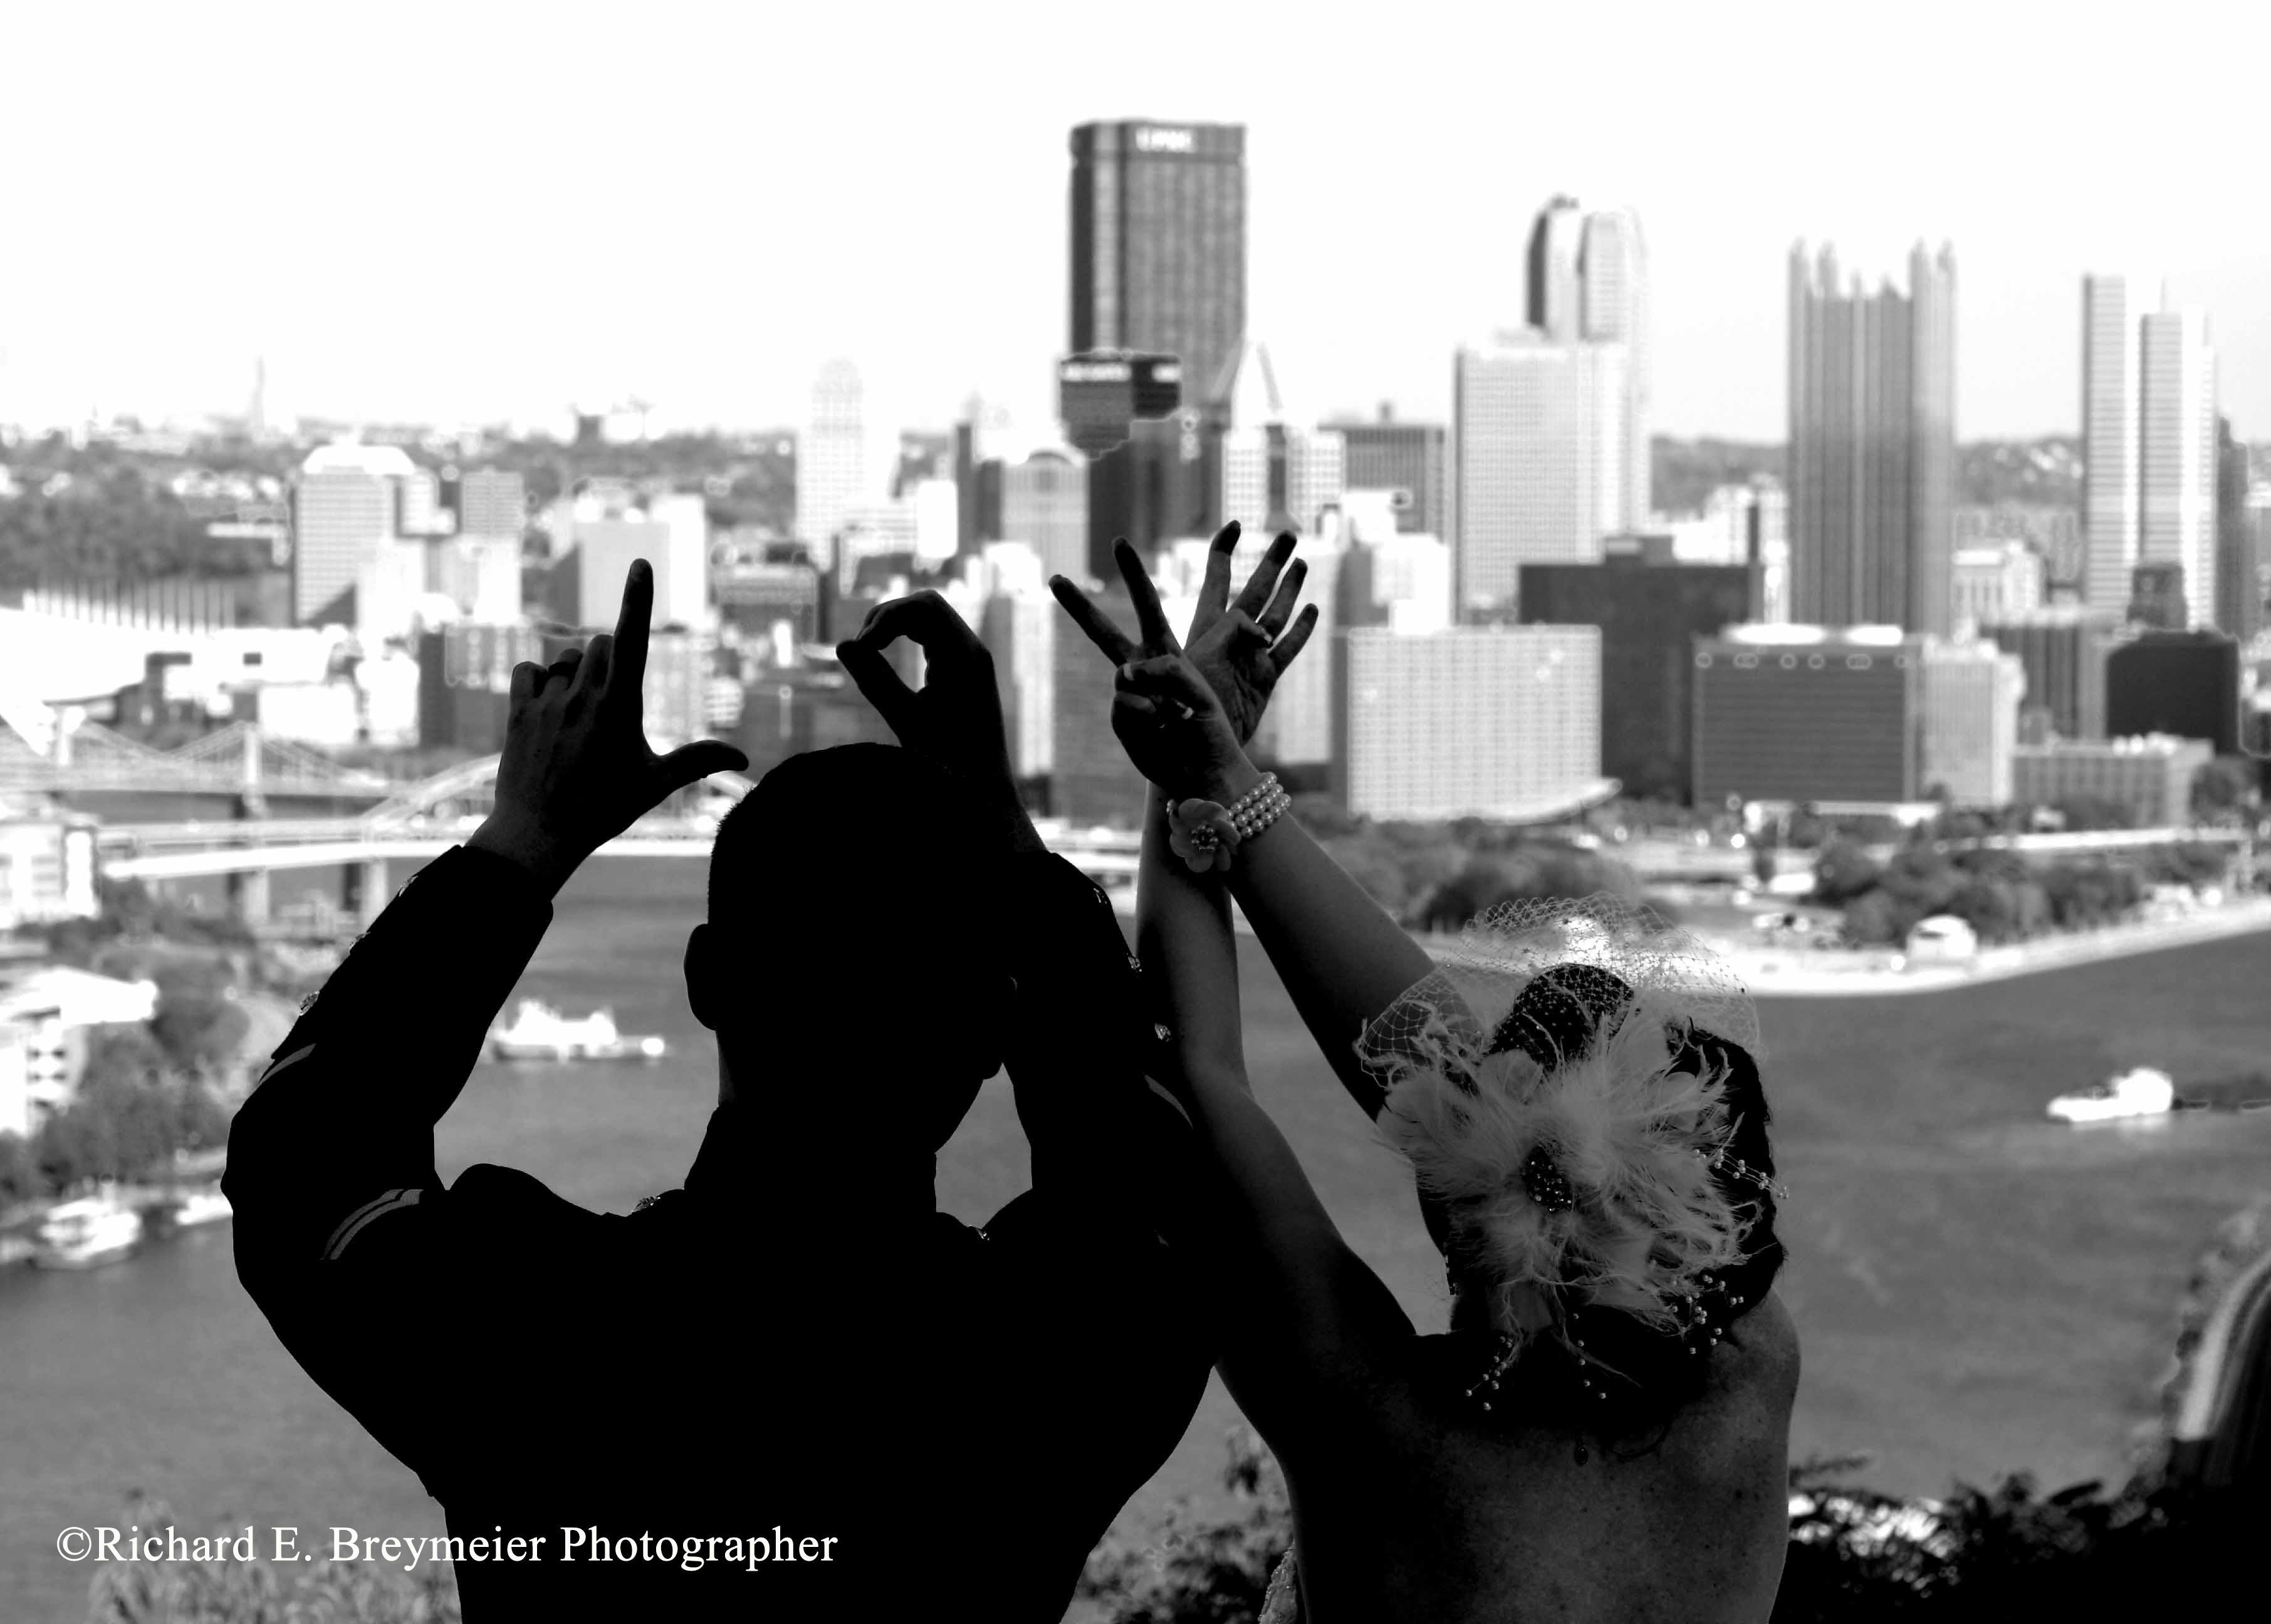 Richard E Breymeier Photographer image 13